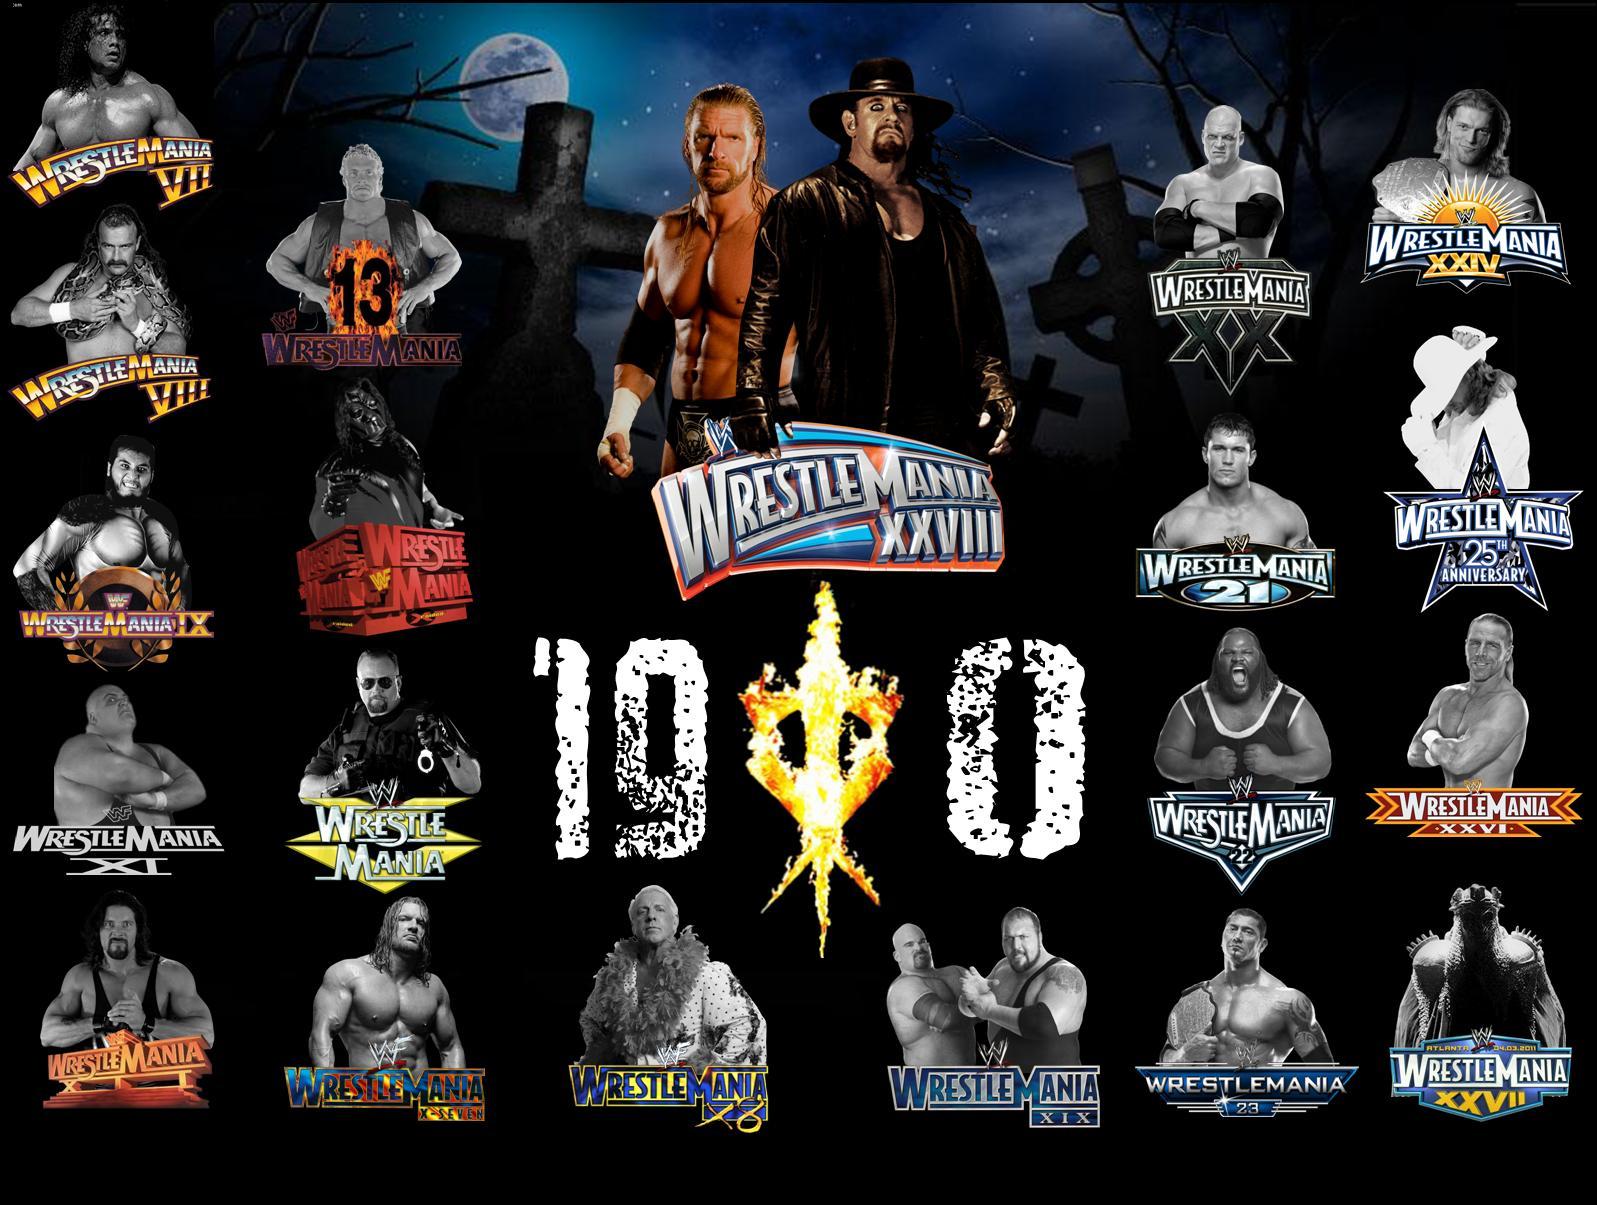 19-0, la actual Racha de The Undertaker rumbo a WrestleMania 28